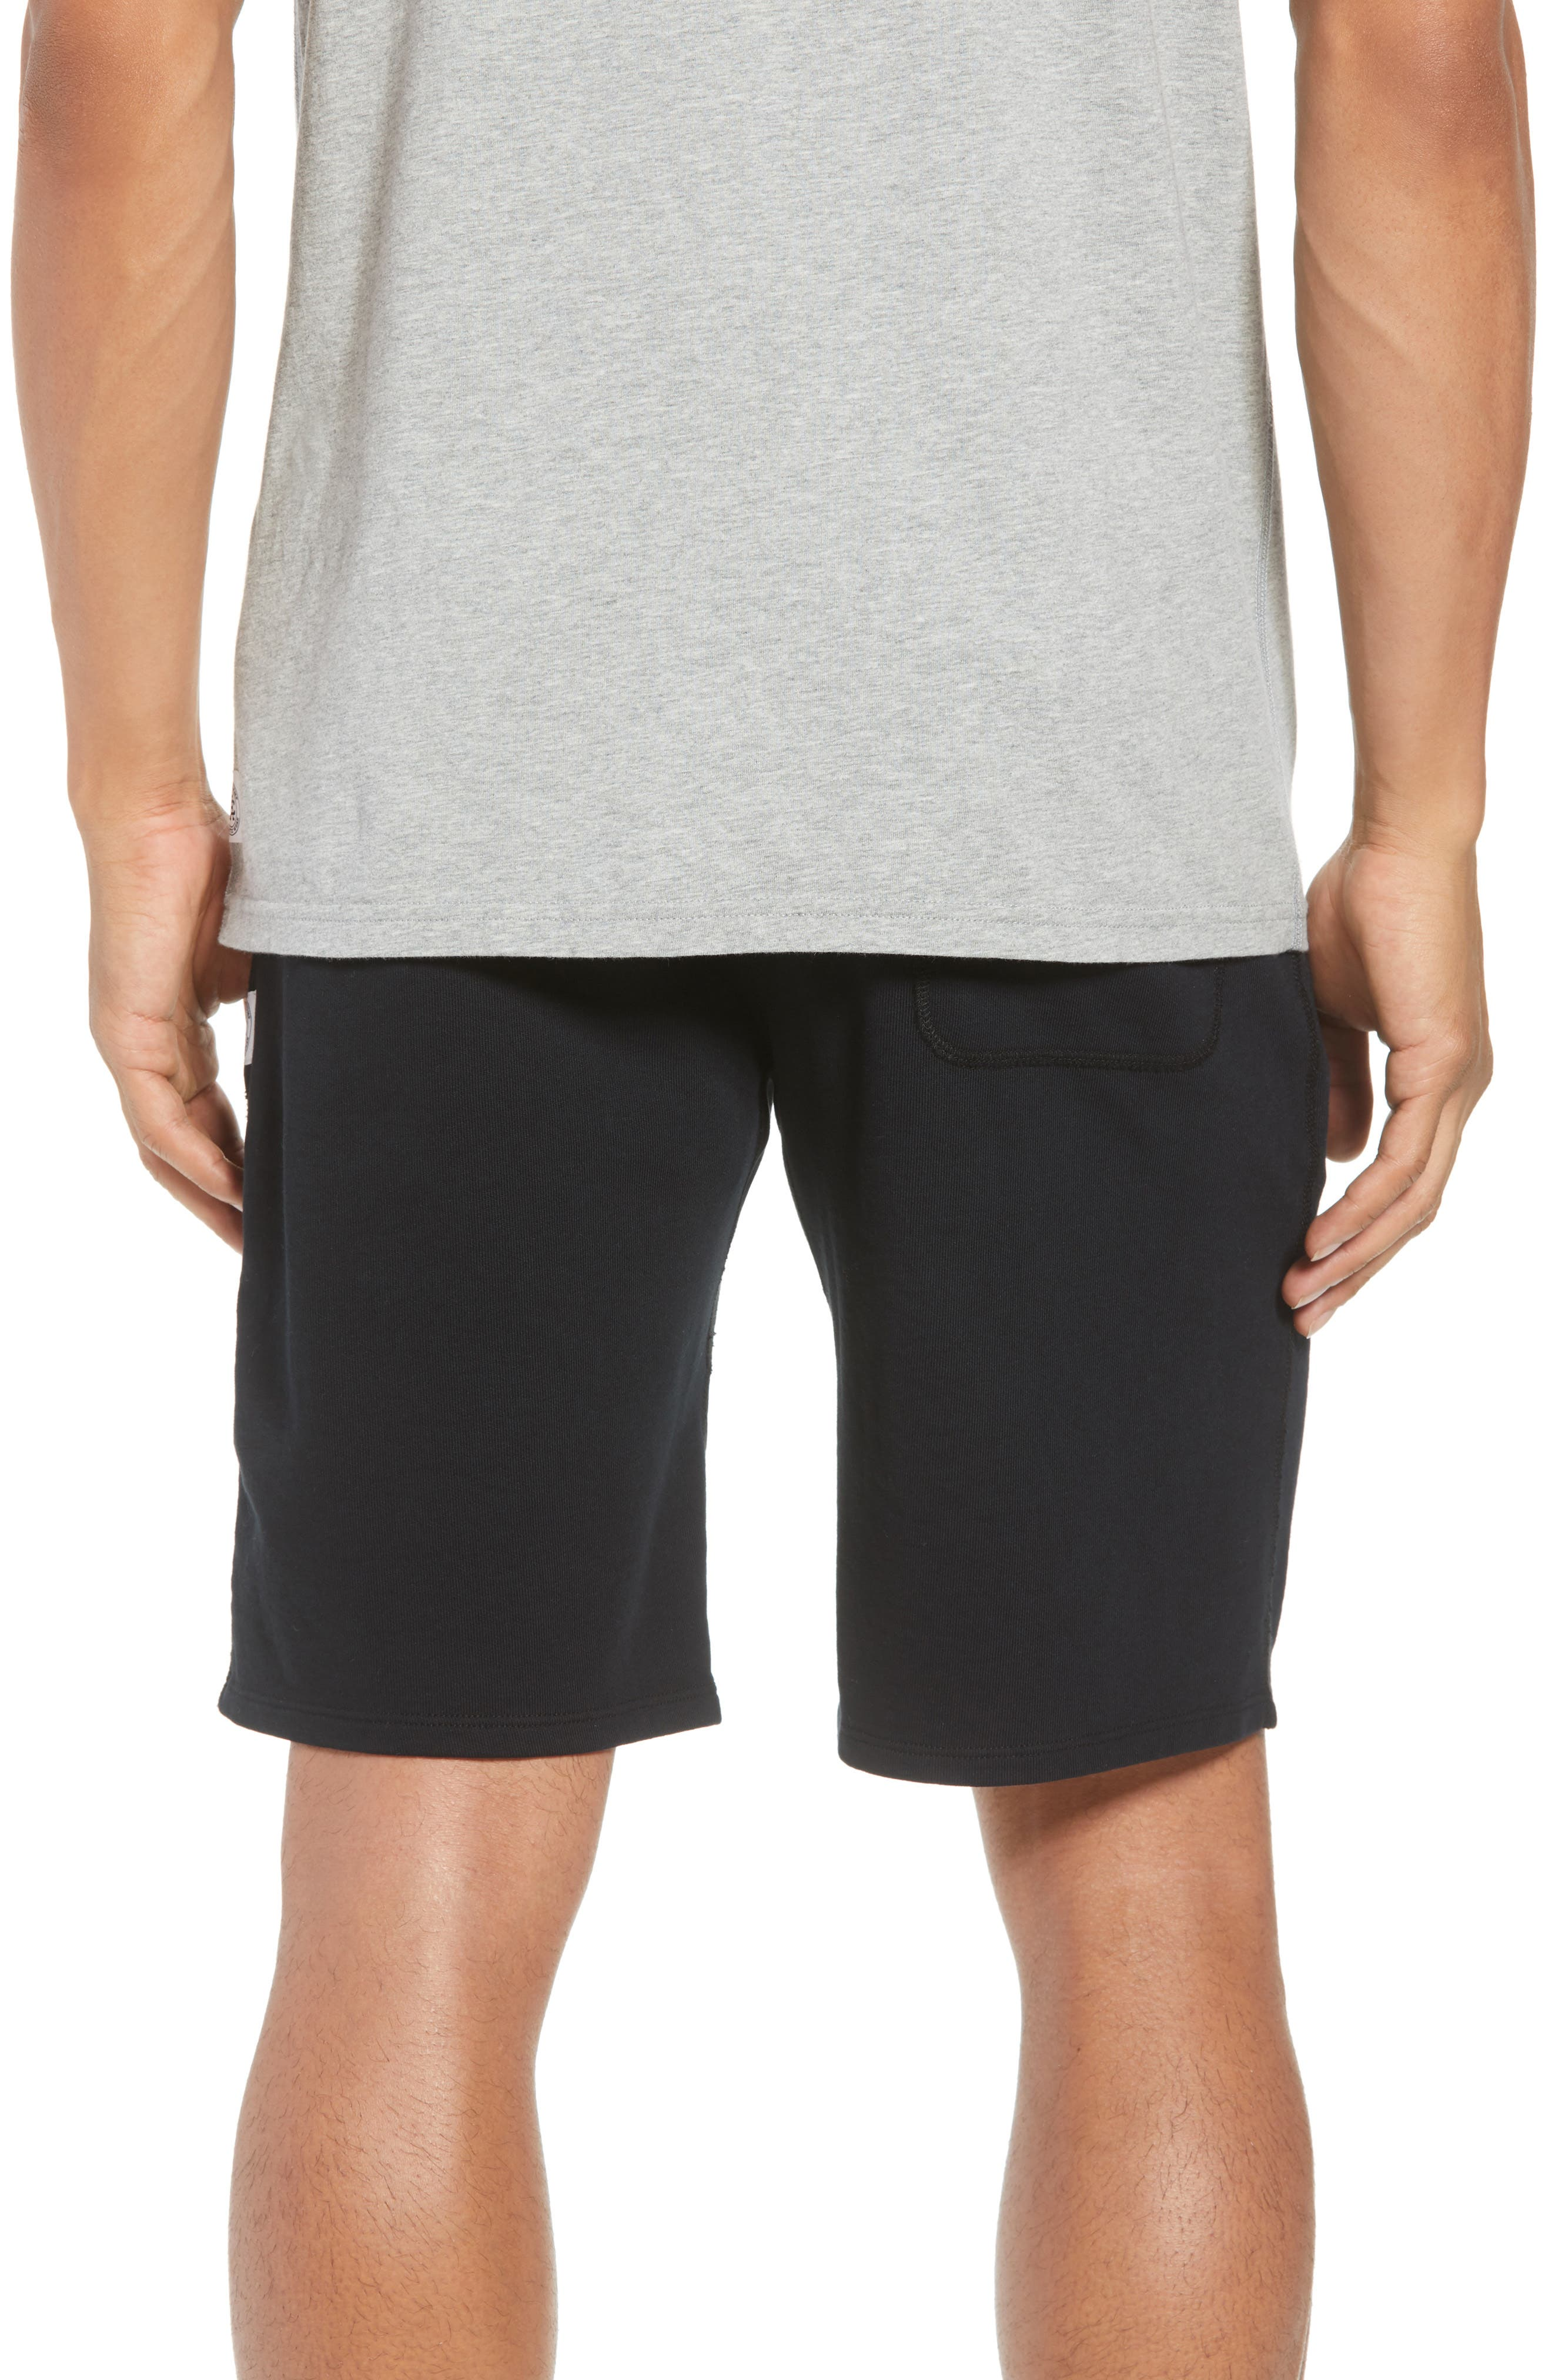 Shorts Lightweight Classic Fit Knit Shorts,                             Alternate thumbnail 2, color,                             BLACK